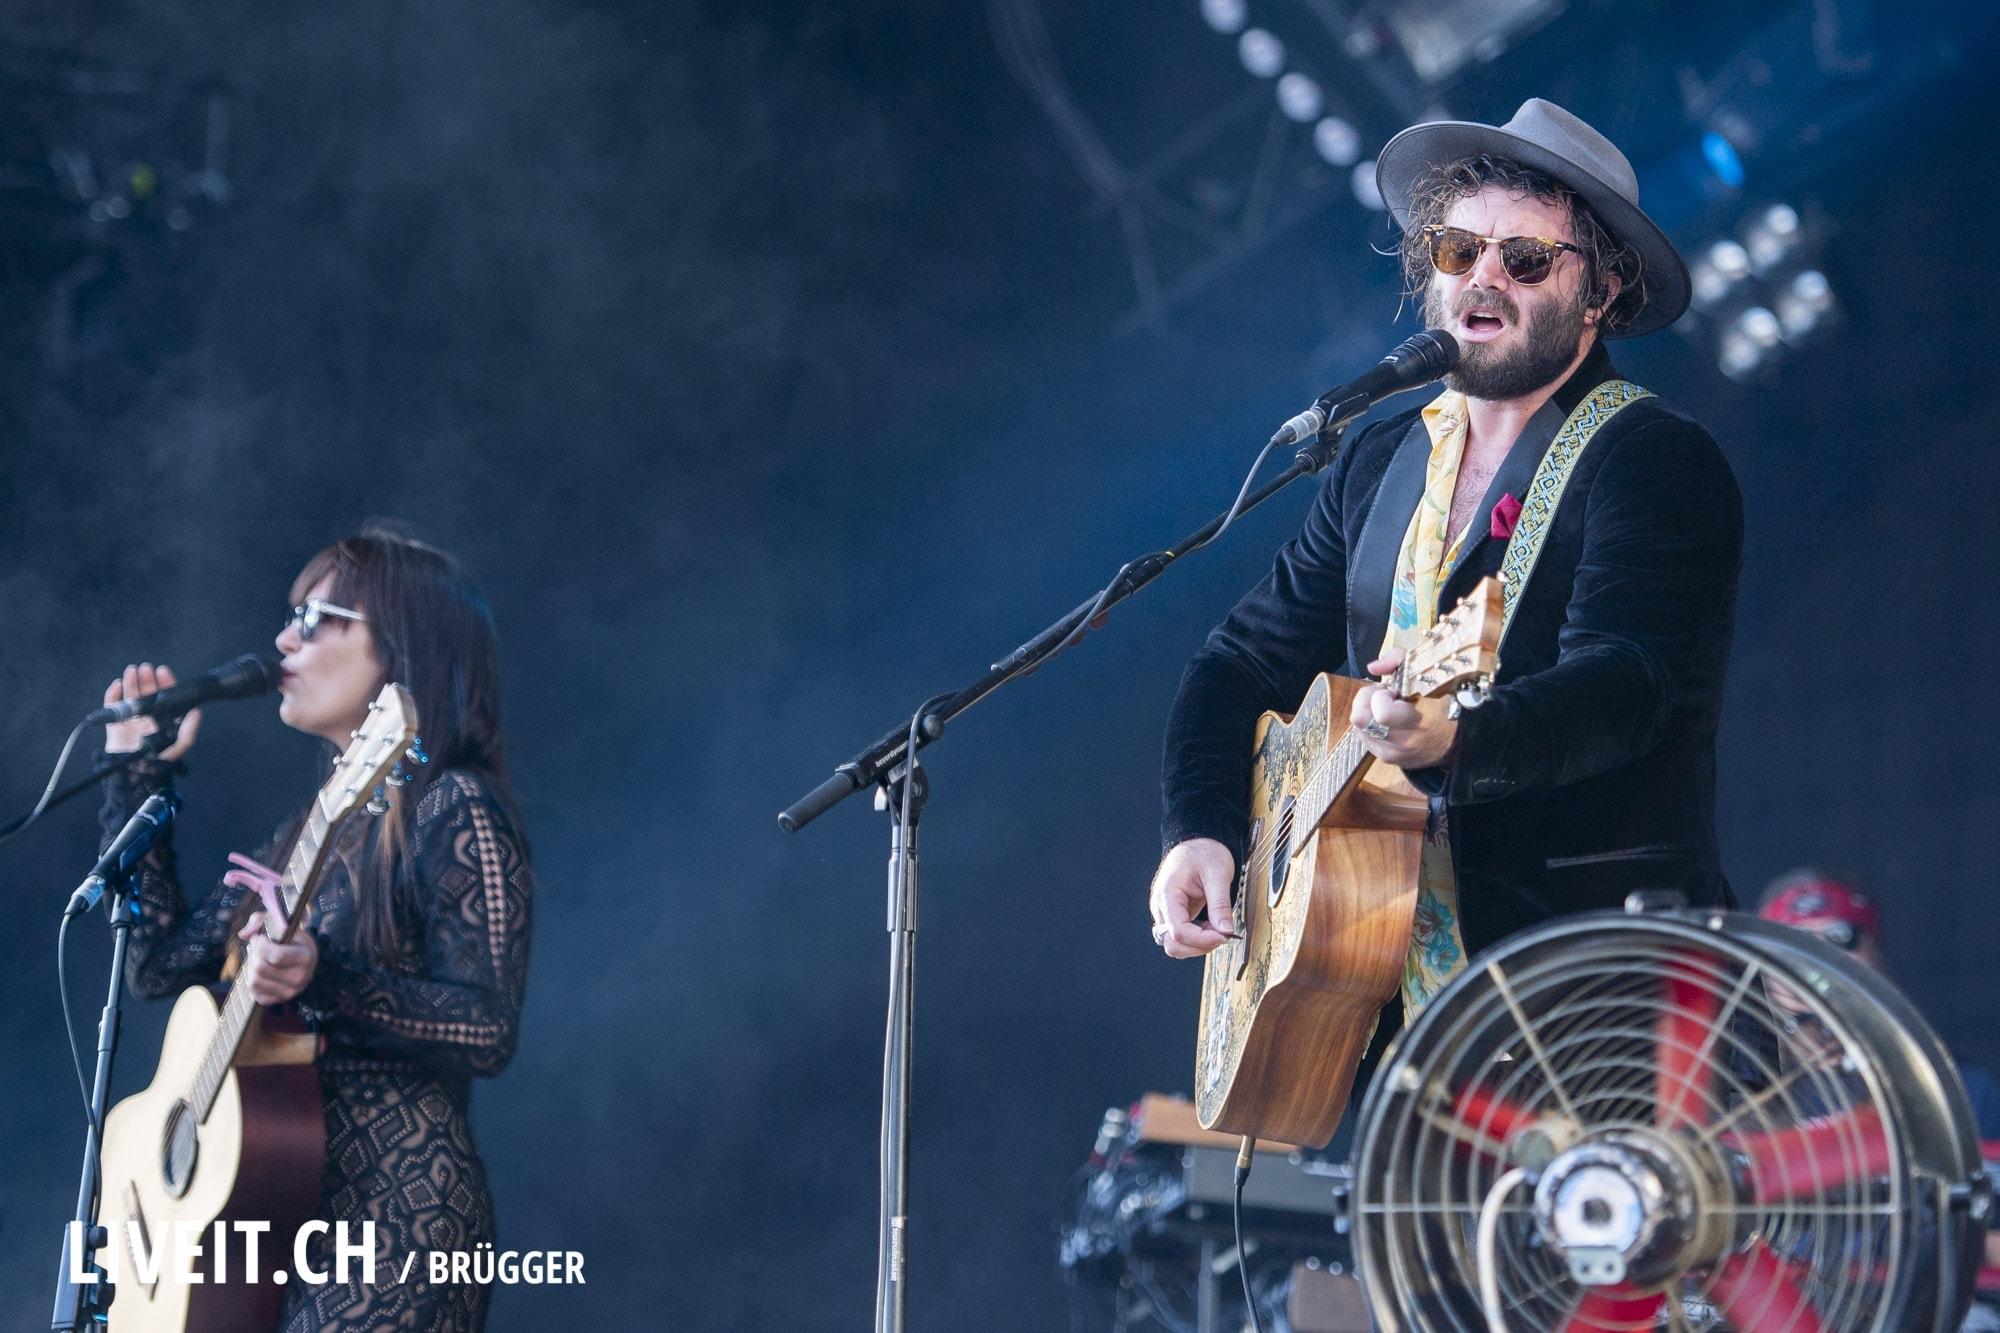 Angus and Julia Stone Gurtenfestival 2018 in Bern. (Dominic Bruegger for Gurtenfestival)